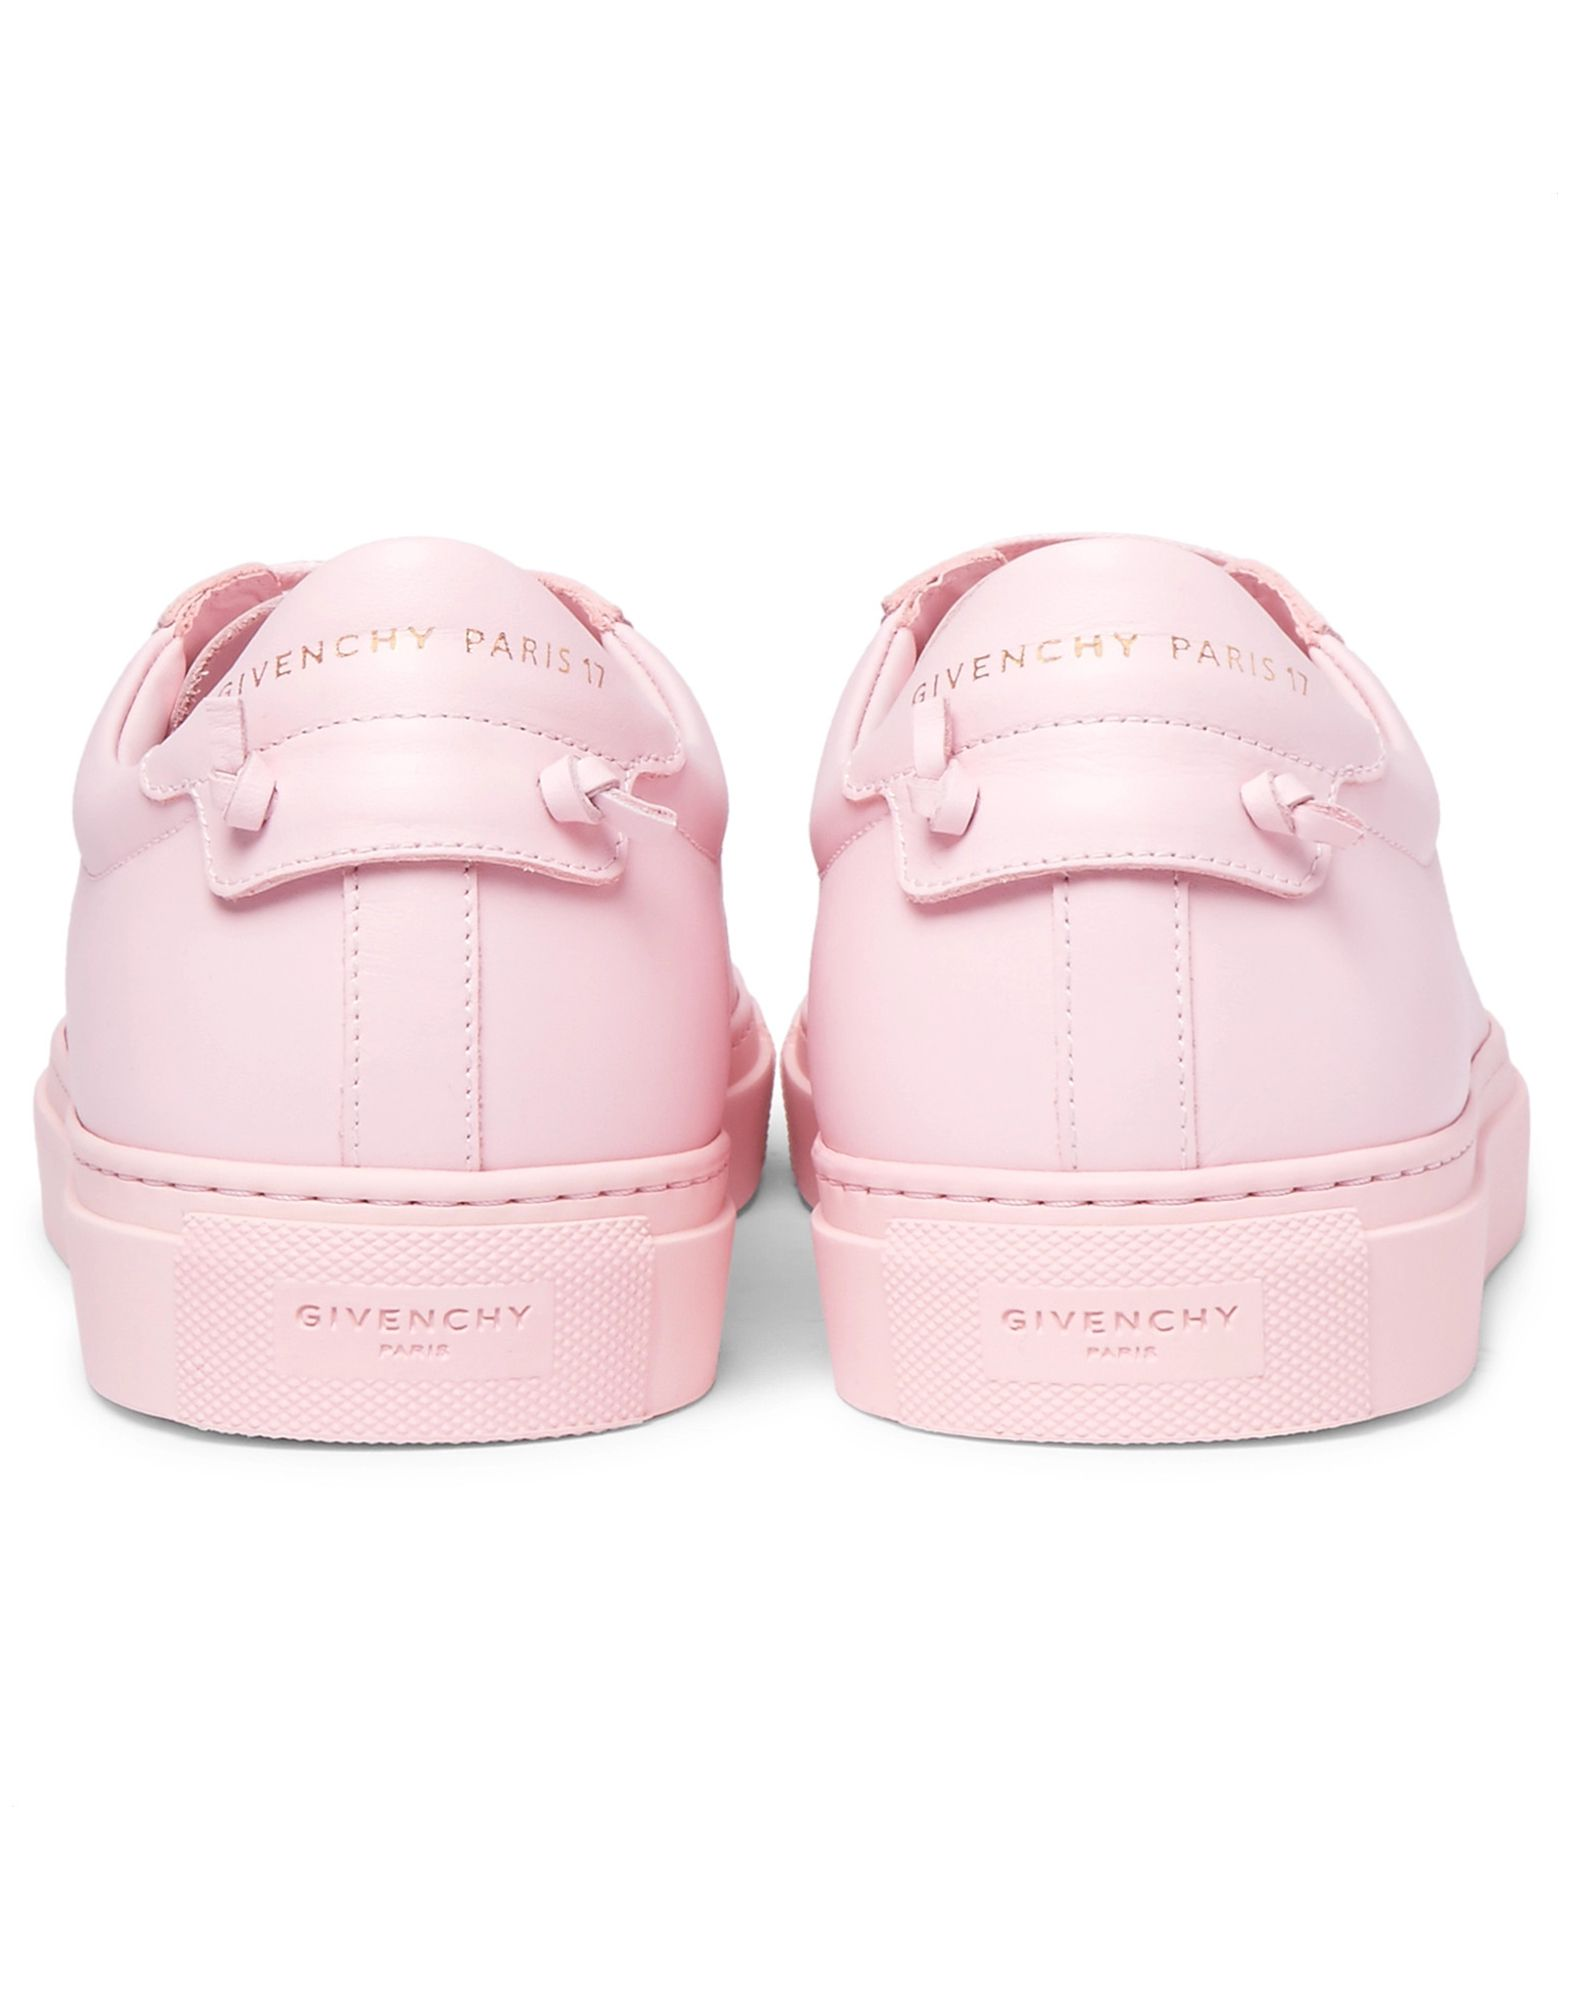 Givenchy Sneakers Herren  11540647LA Gute Qualität beliebte Schuhe